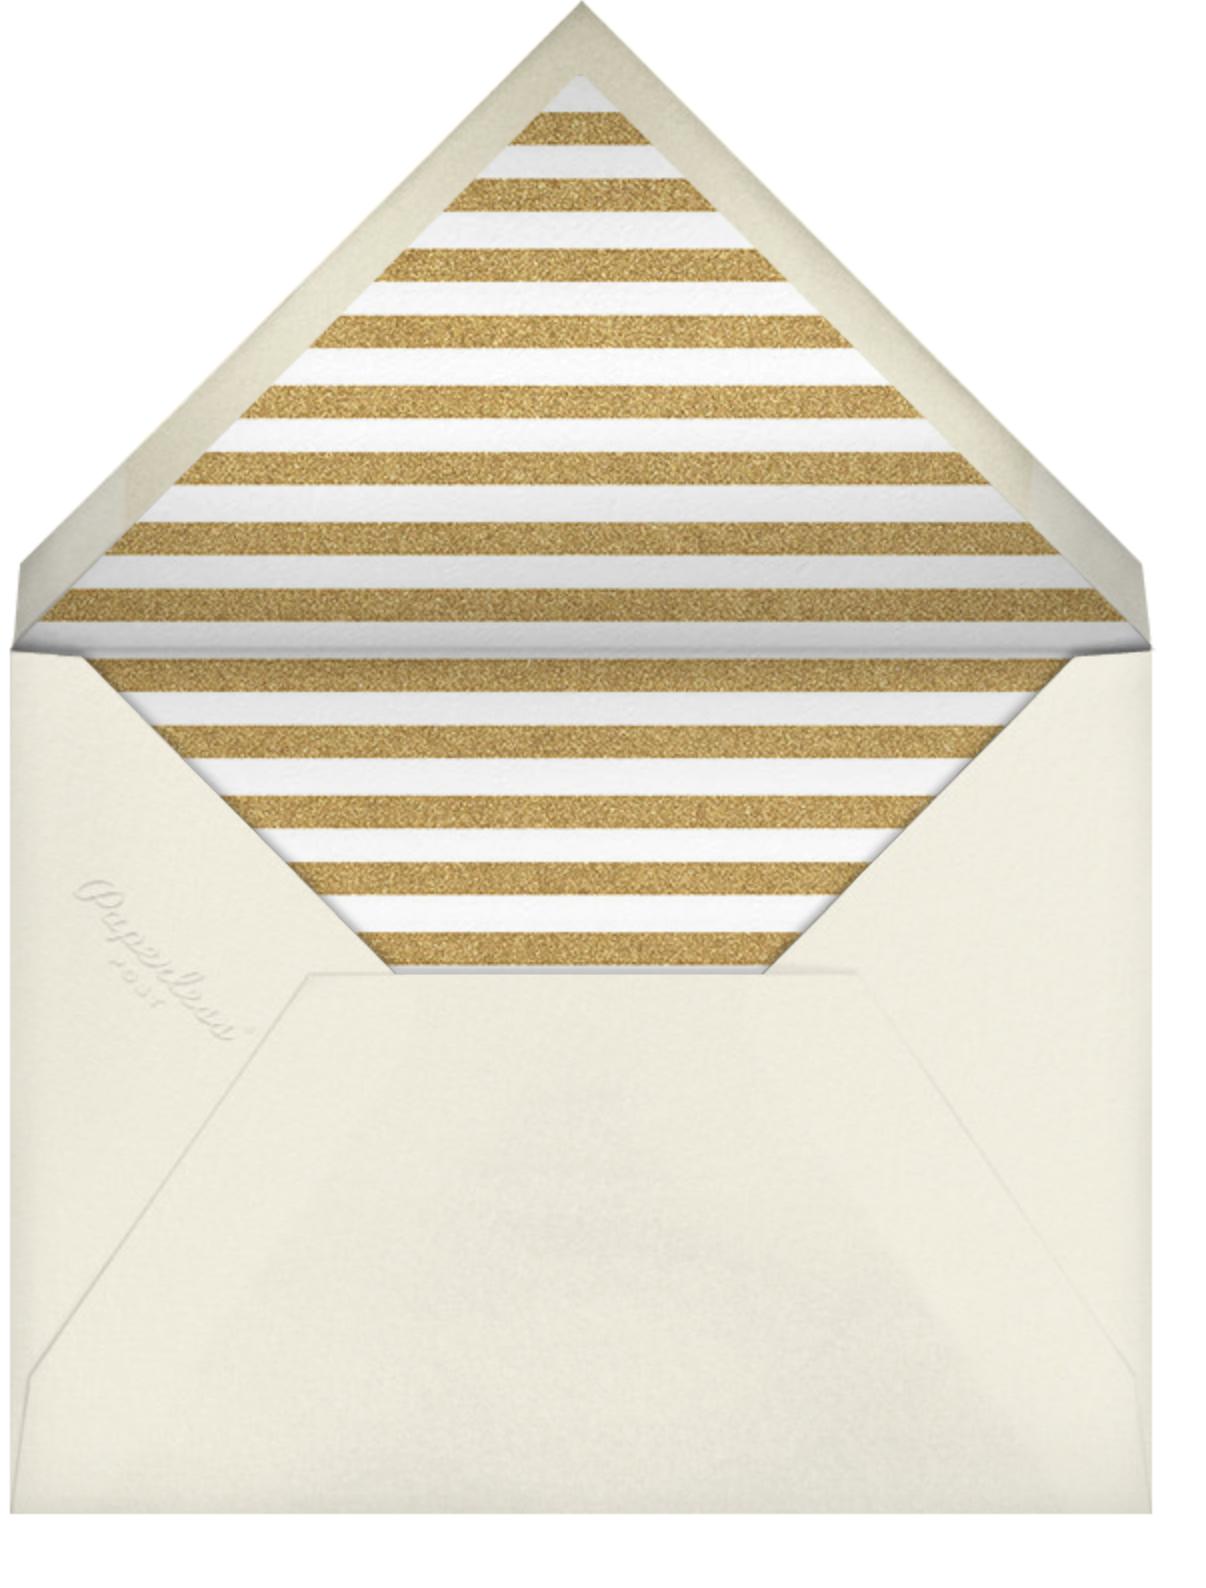 Deco Invite - Black And Gold - The Indigo Bunting - The Indigo Bunting - envelope back